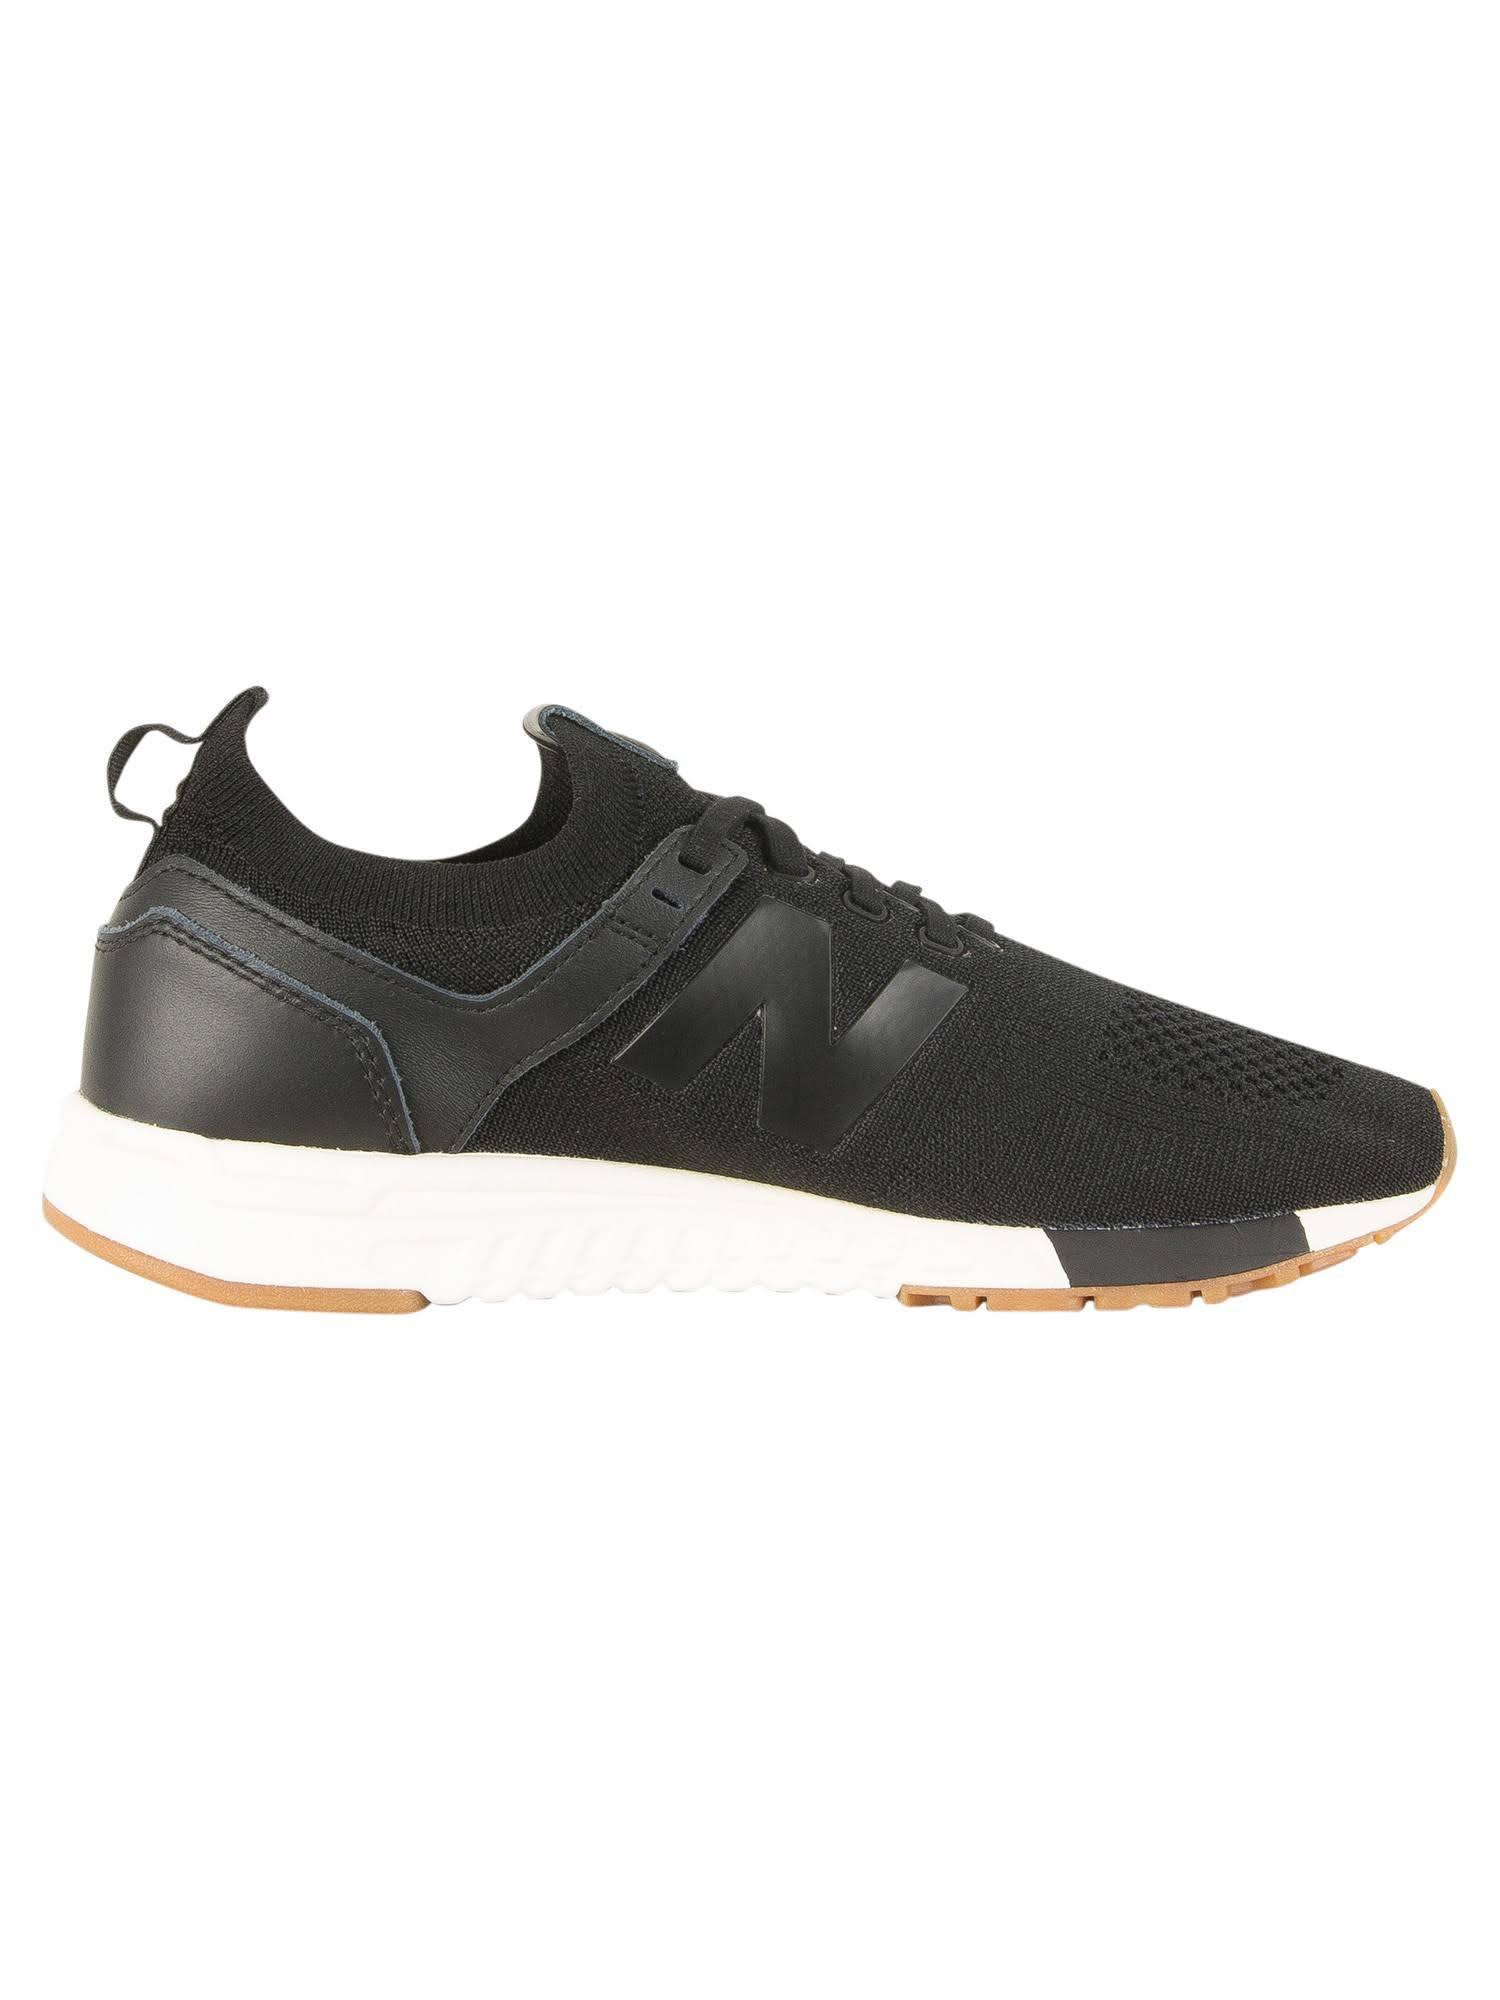 Size New Mrl247db 10 Balance Black Mens Size Trainer Mesh YqaCY